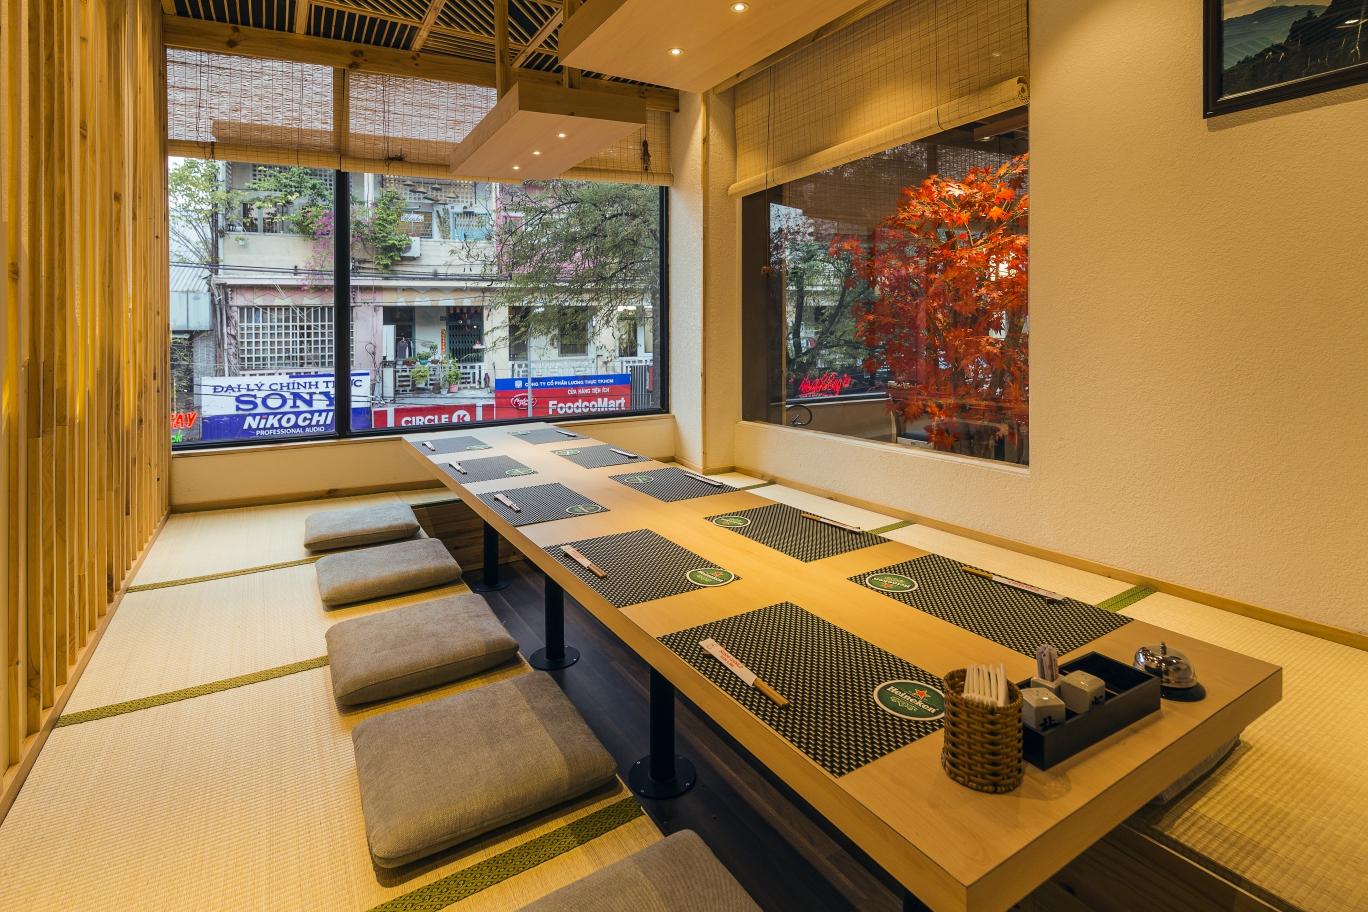 noi-that-nha-hang-sushiworld-12